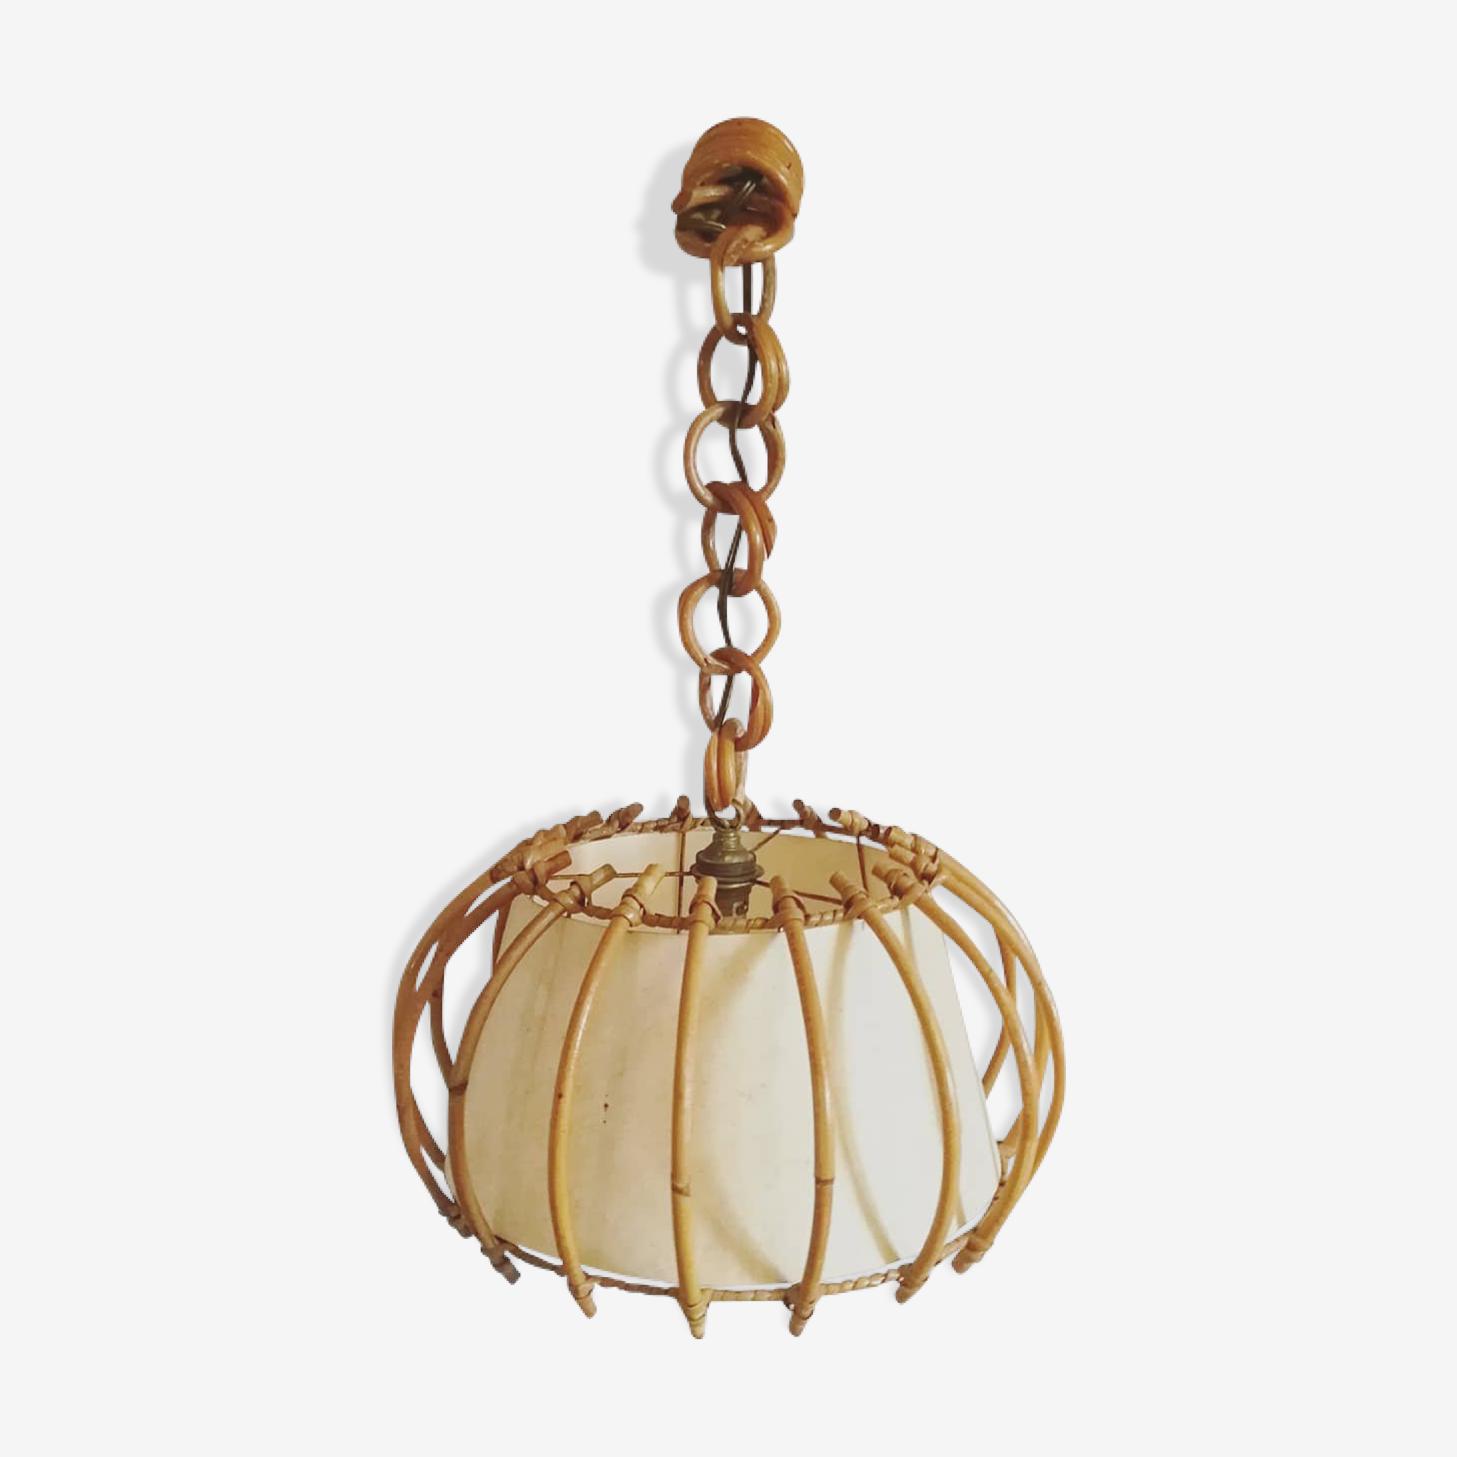 Lamp ceiling light rattan, Bohemian chic decoration / vintage 60's